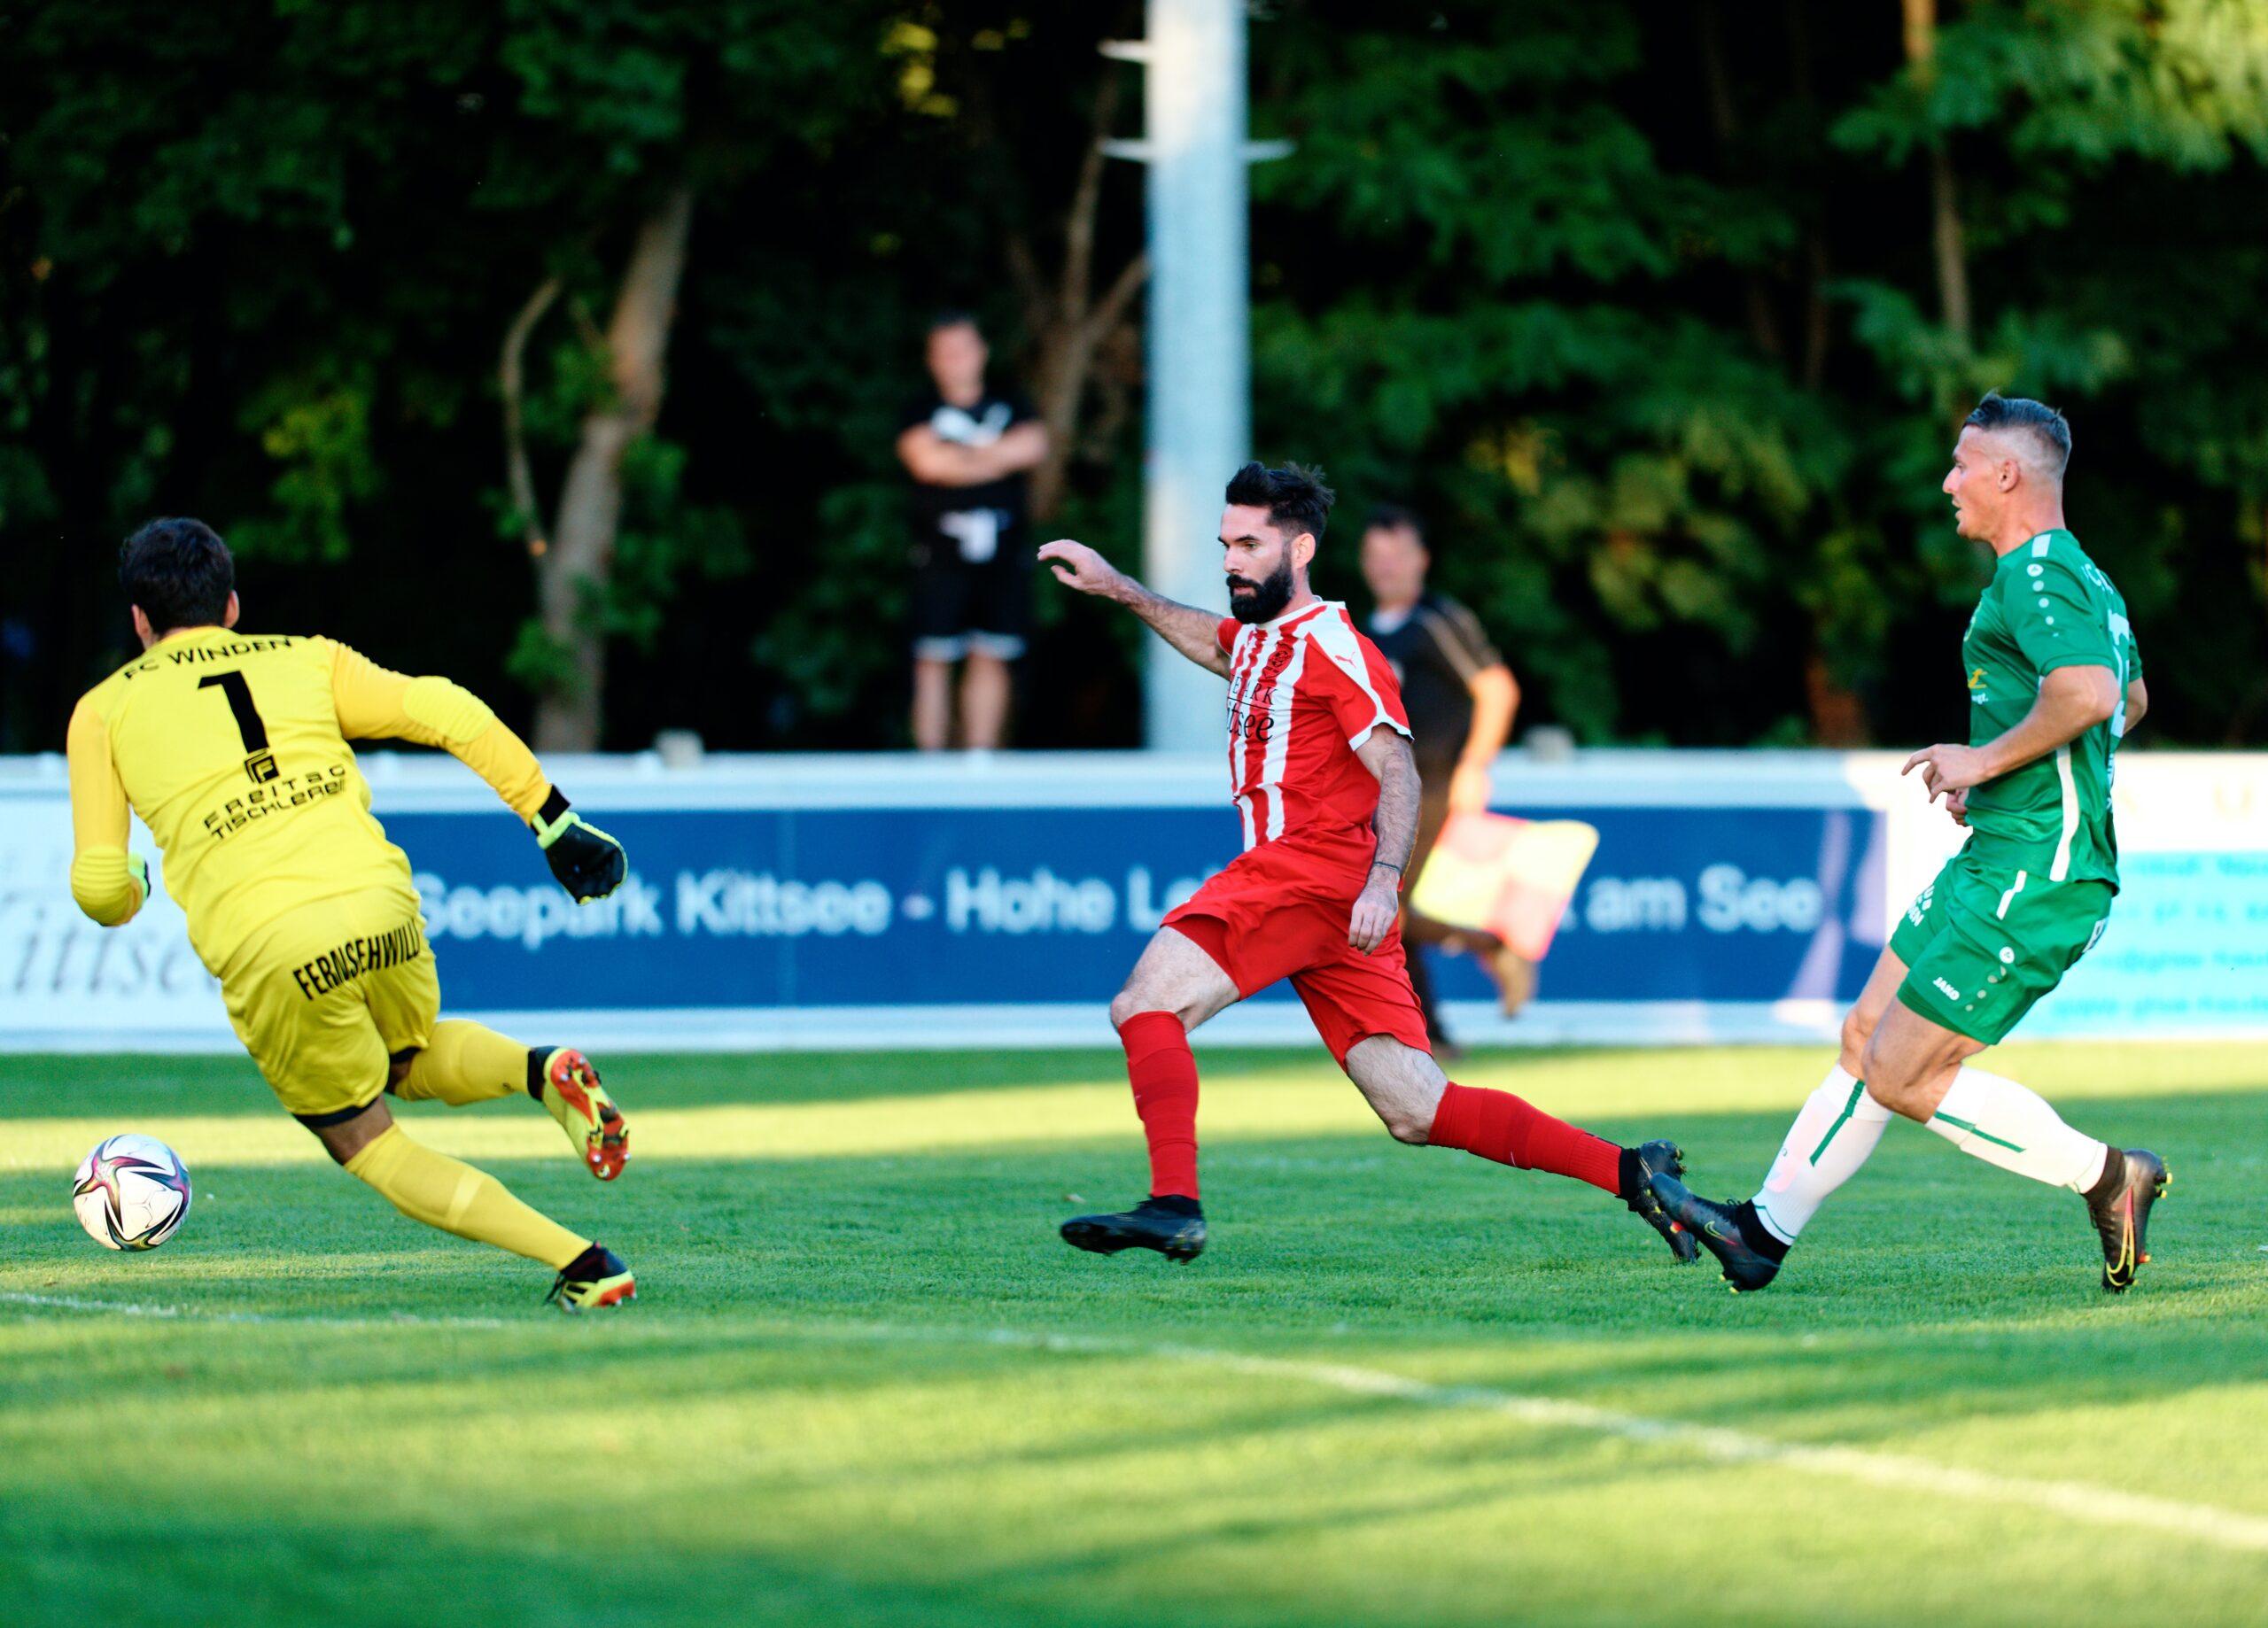 Juraj Fuska in front of goal